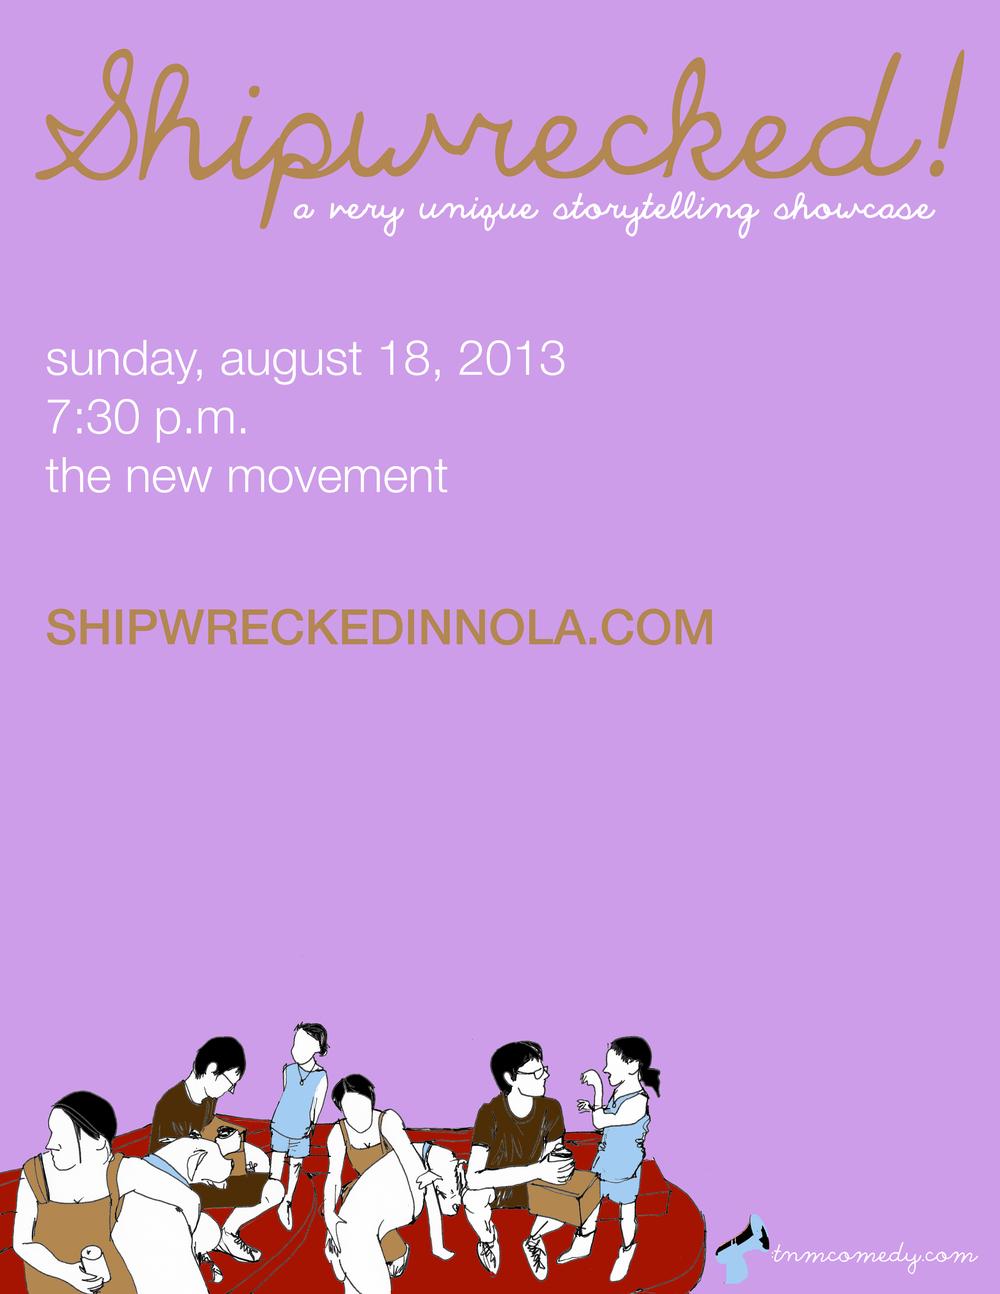 shipwrecked13.jpg